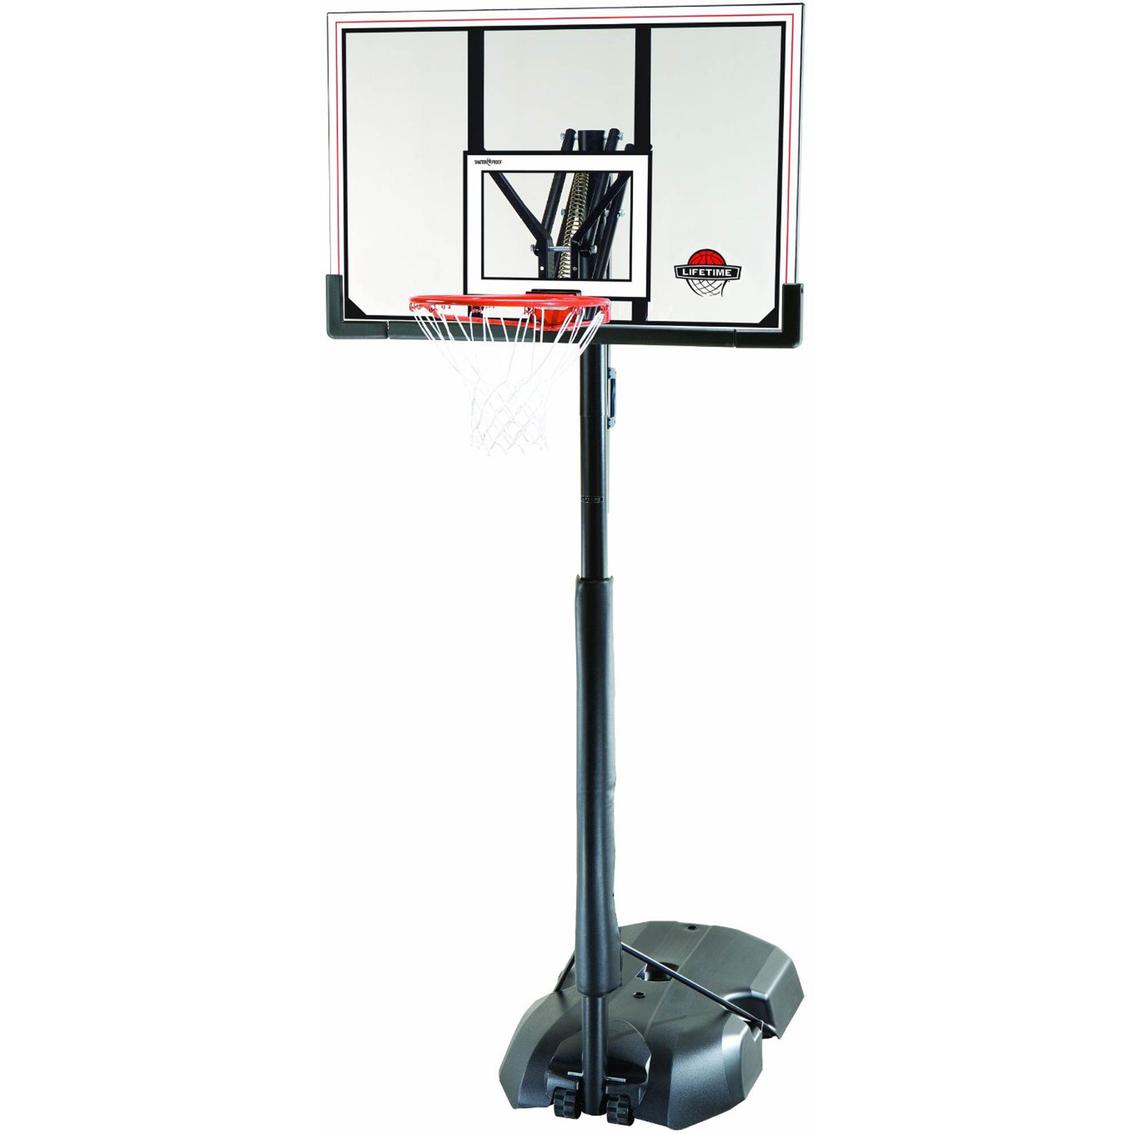 Reebok 52 Xl Portable Basketball Hoop - Reebok Of Ceside.Co